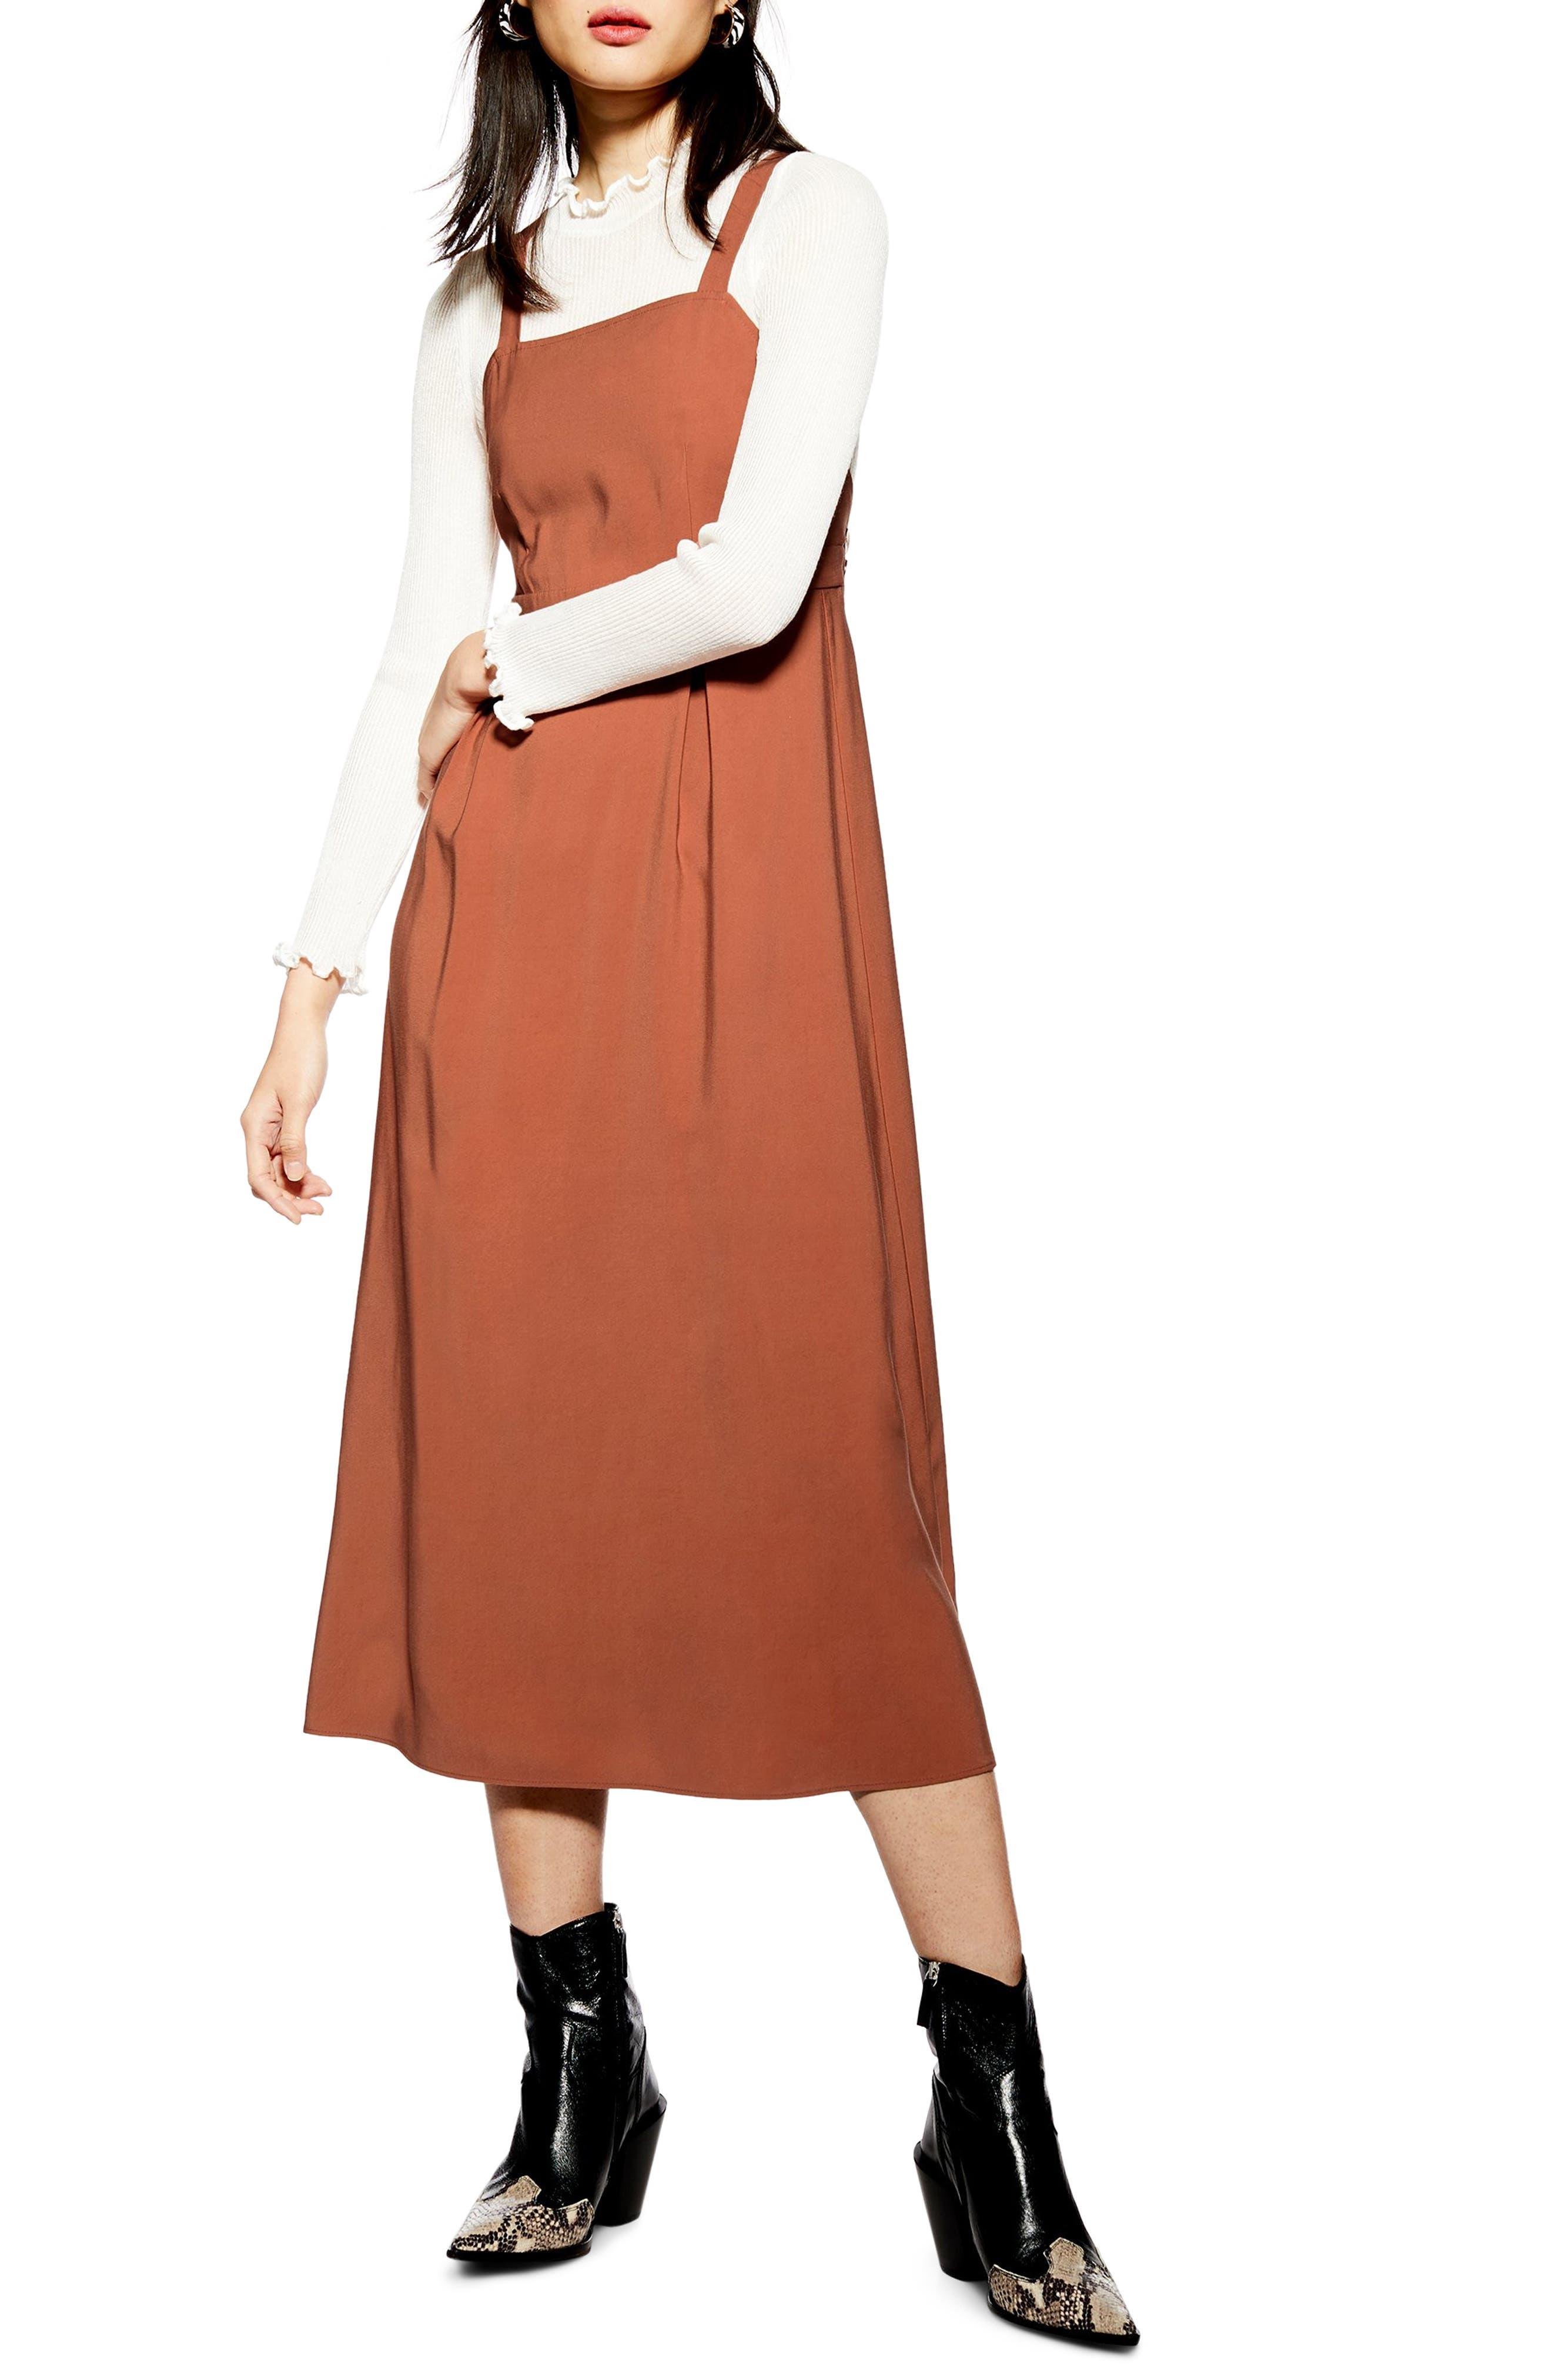 Topshop Tilda Pinafore Midi Dress, US (fits like 2-4) - Brown